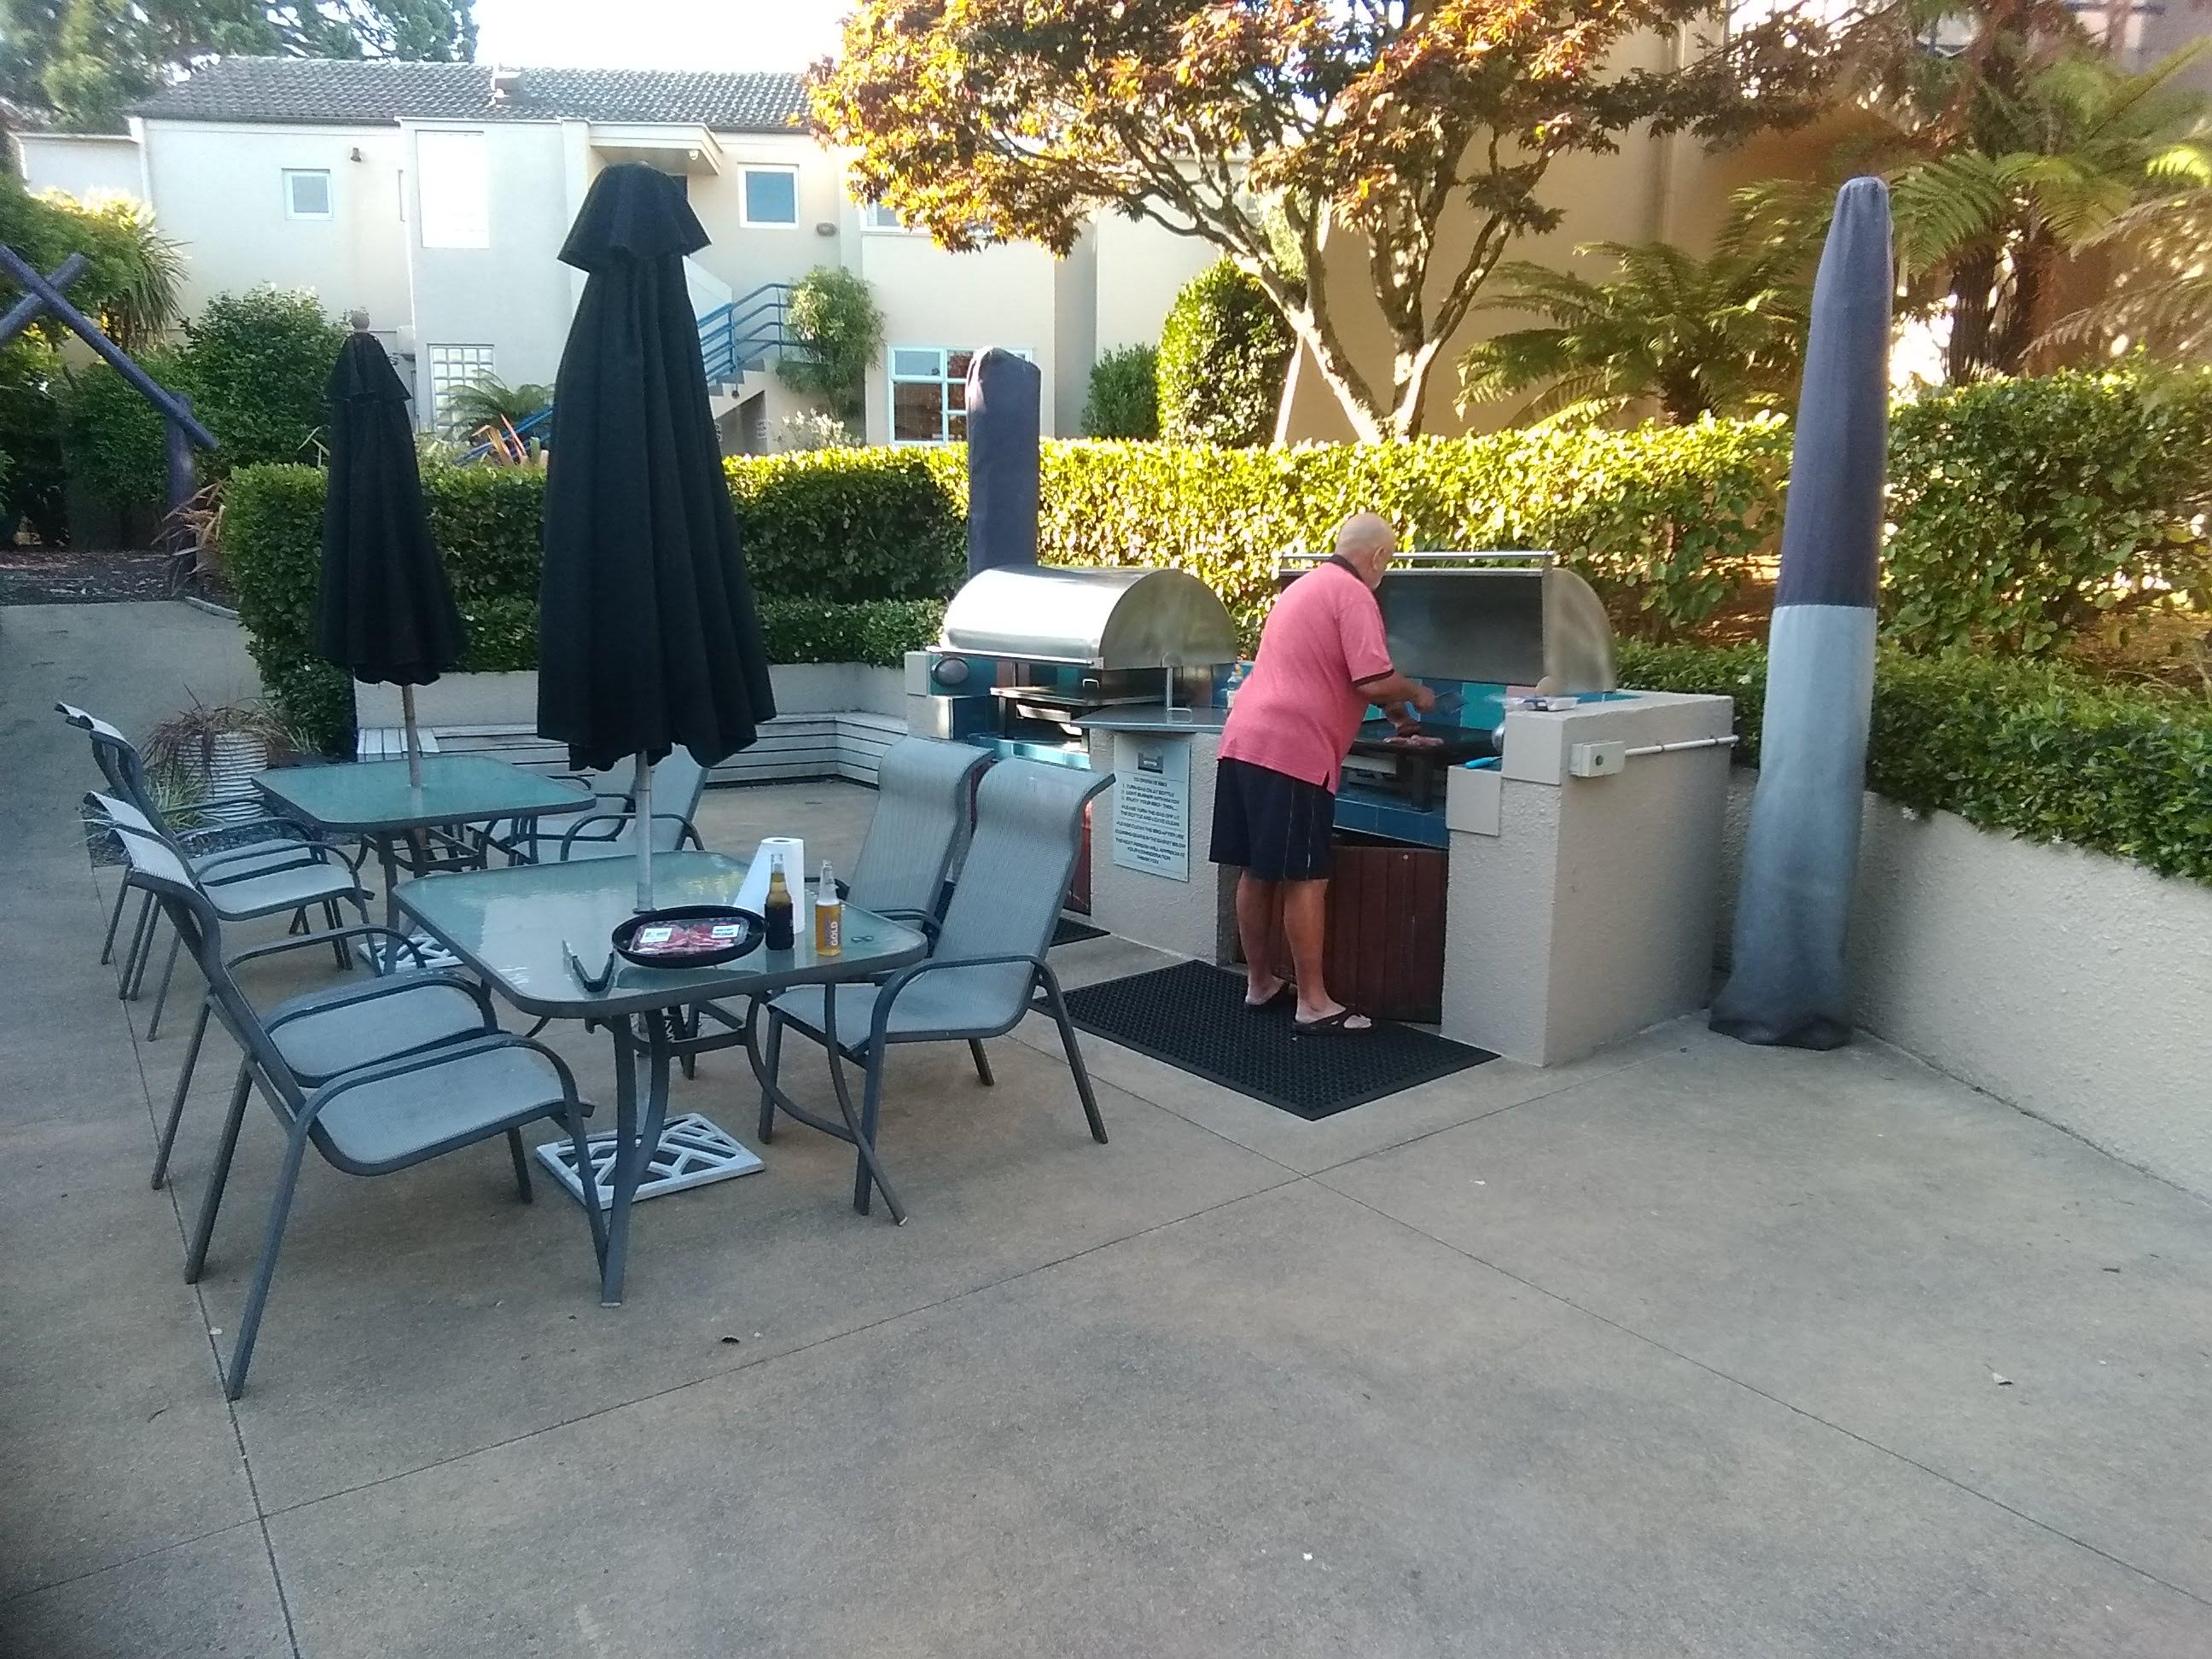 The BBQ area at Village Resort Taupo